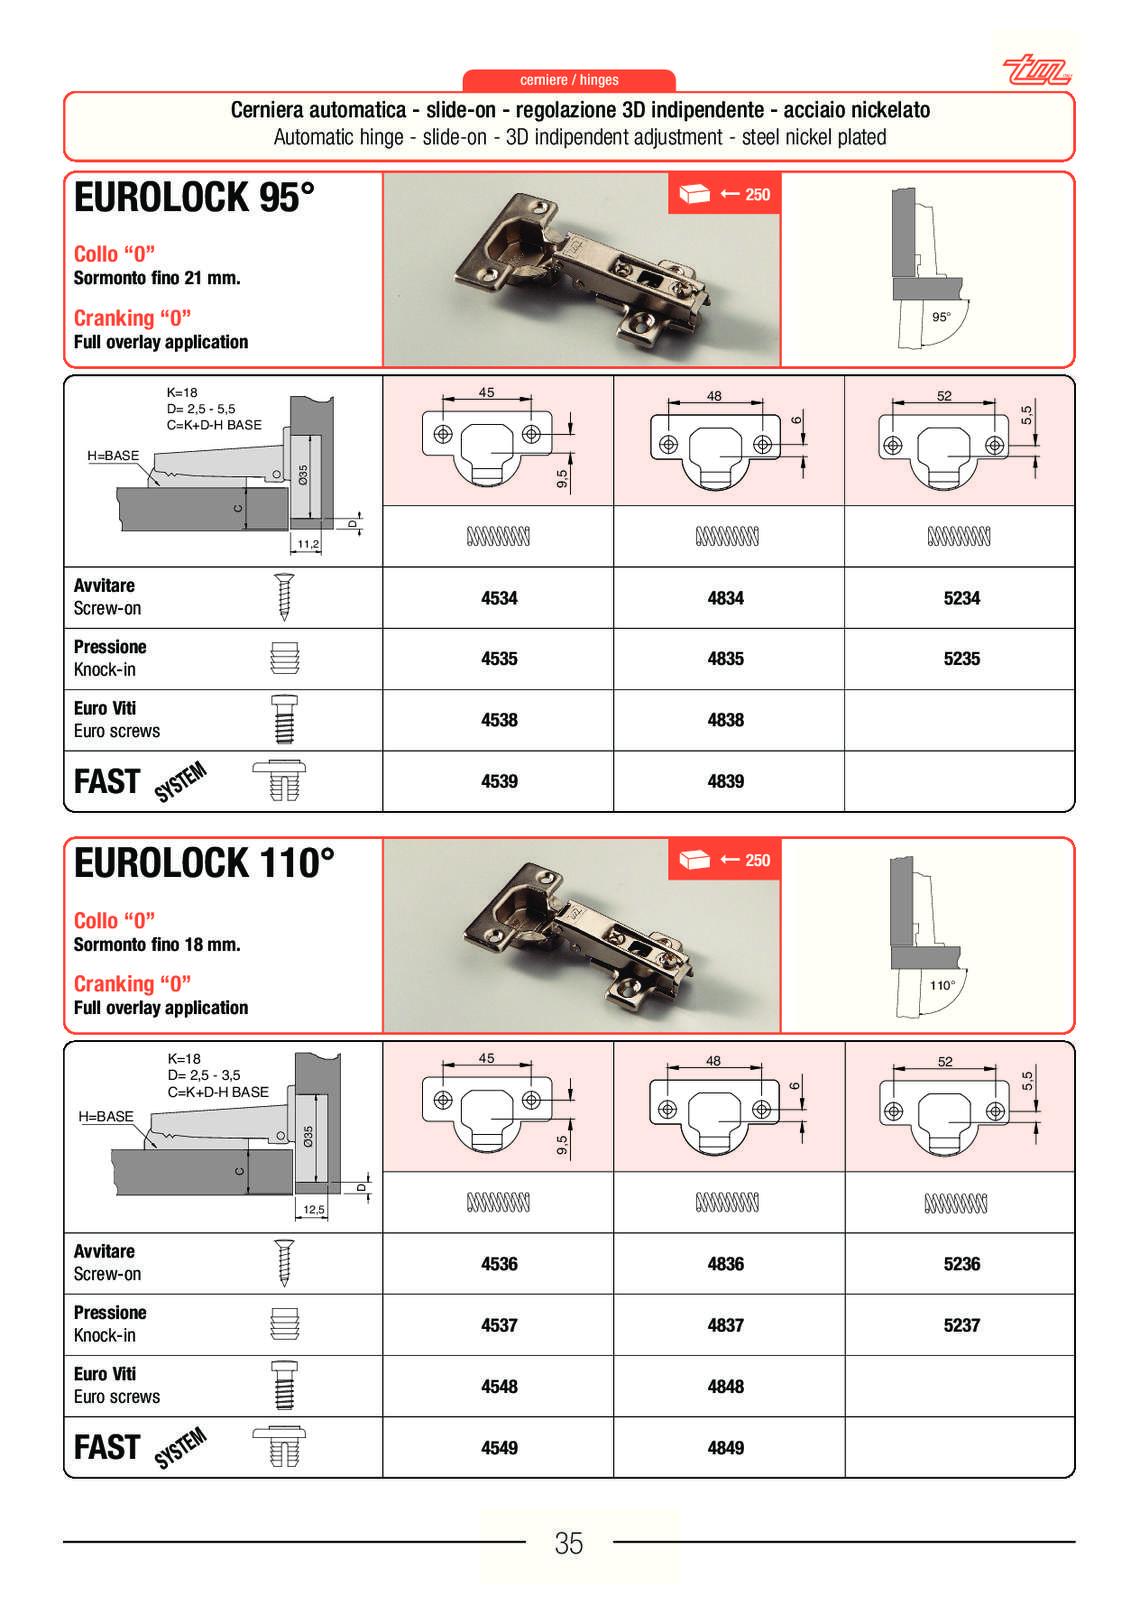 euro-hinges-catalogue_175_034.jpg